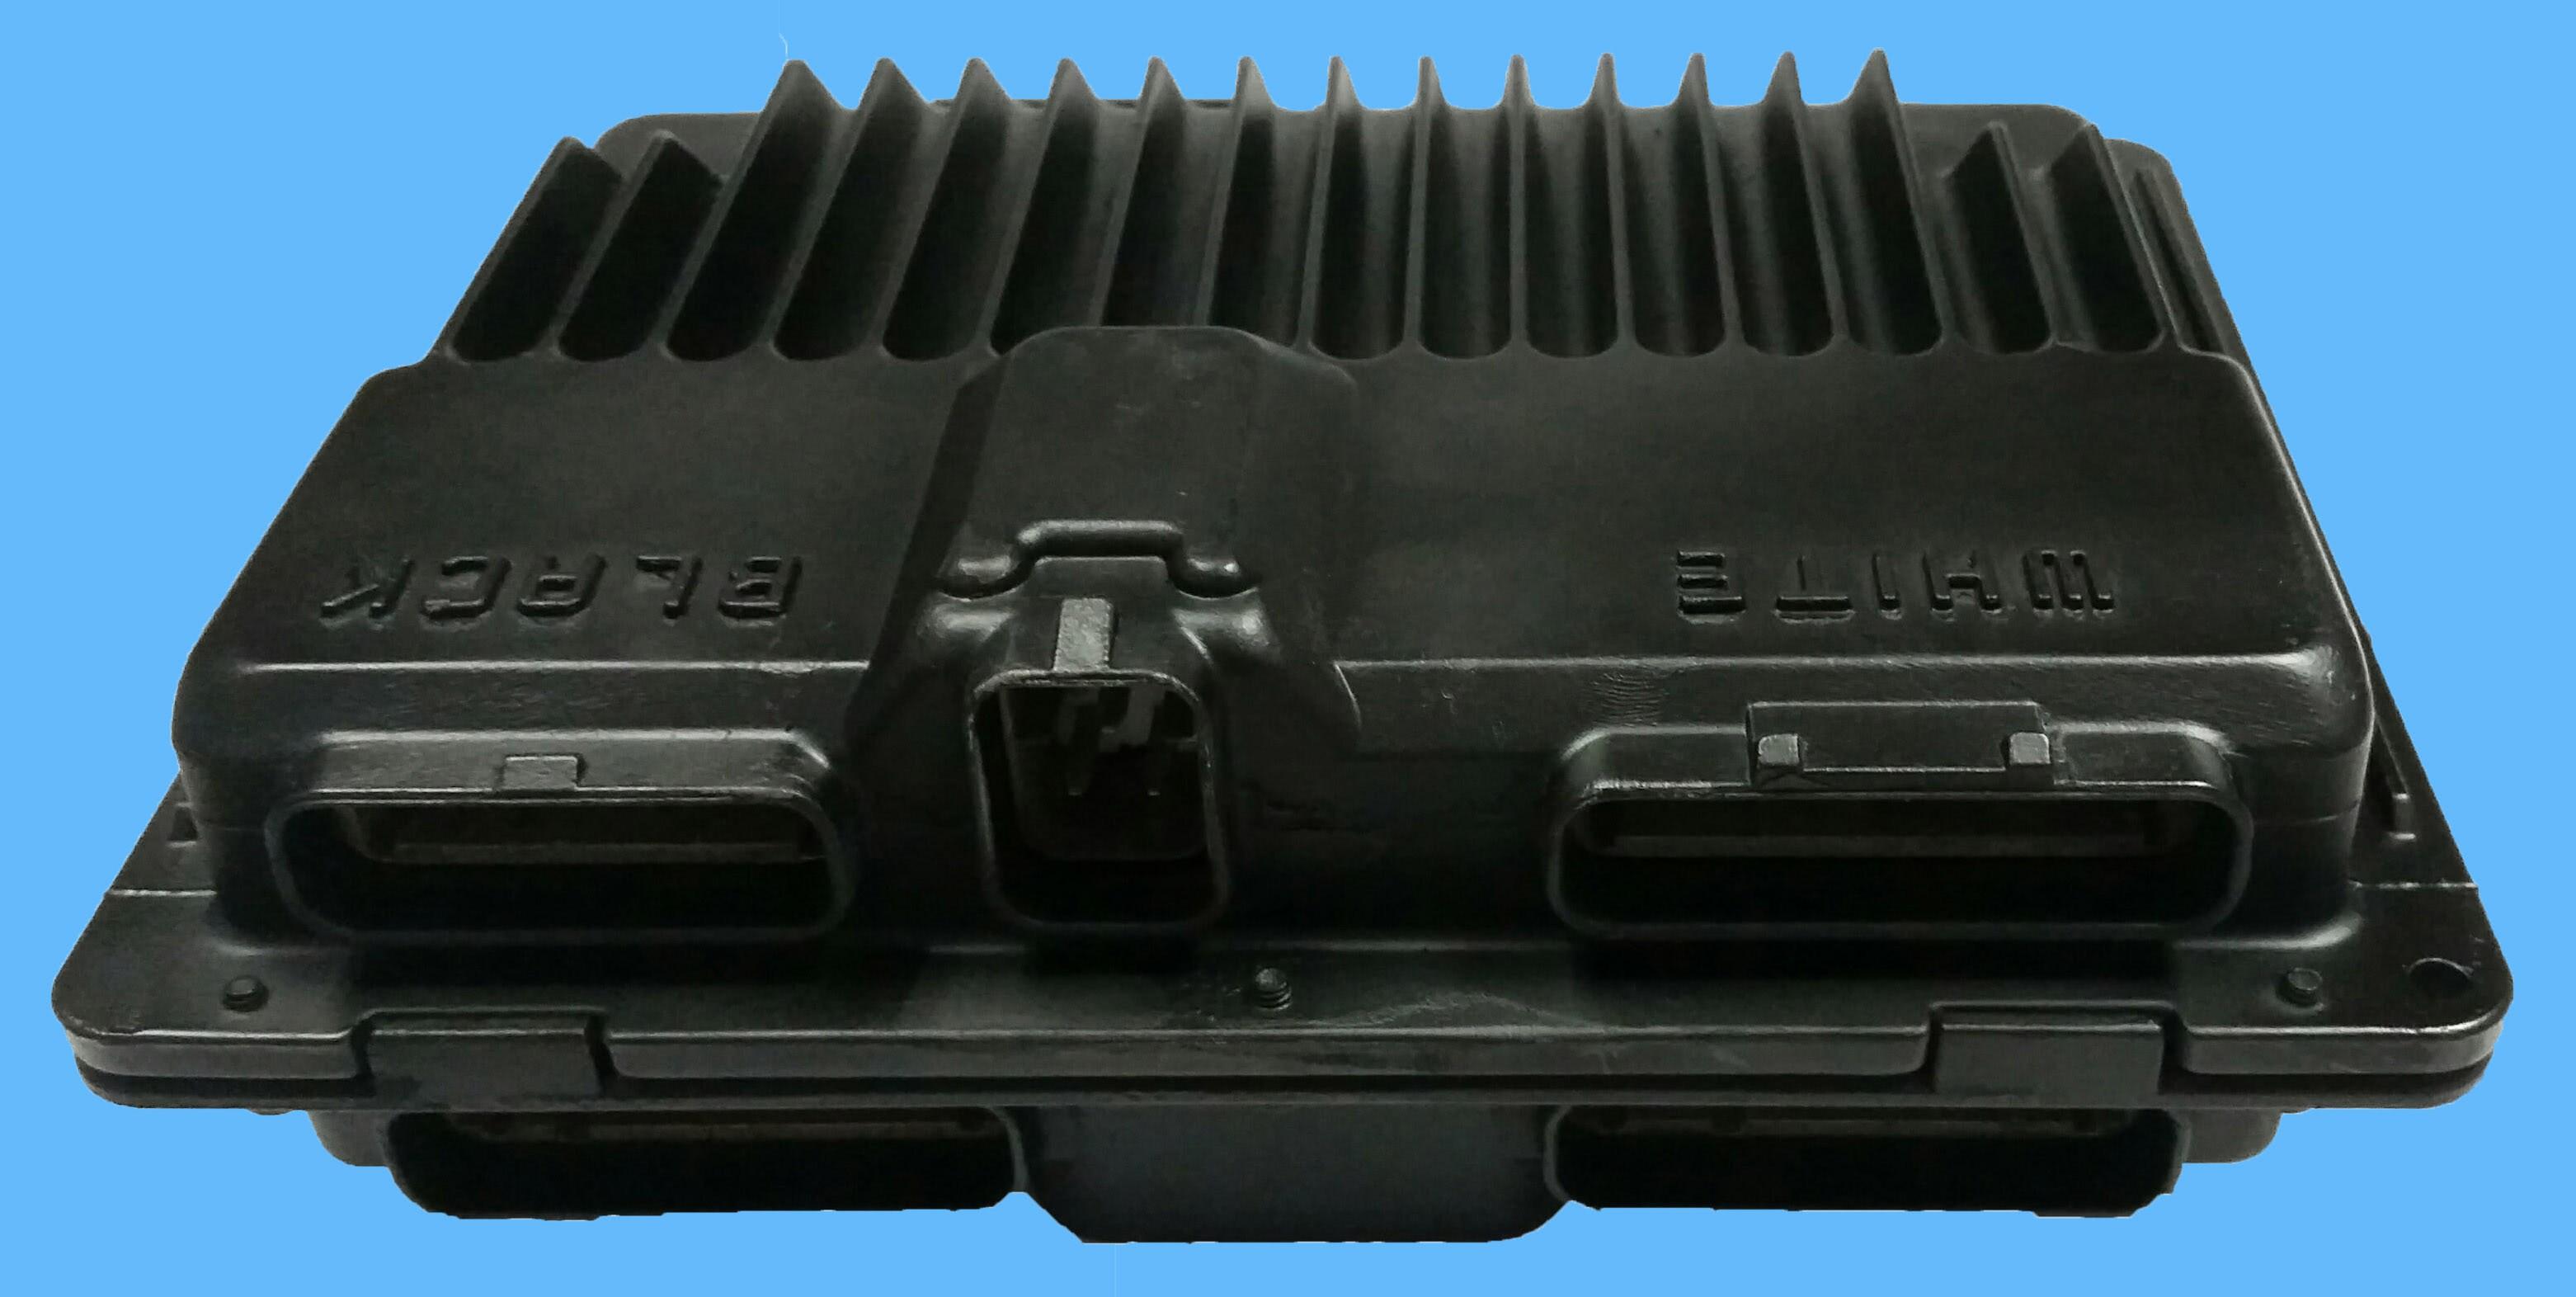 1999 Chevrolet Tahoe 5.7L V8 Gas Engine Control Module ECM / ECU - Engine Control Module